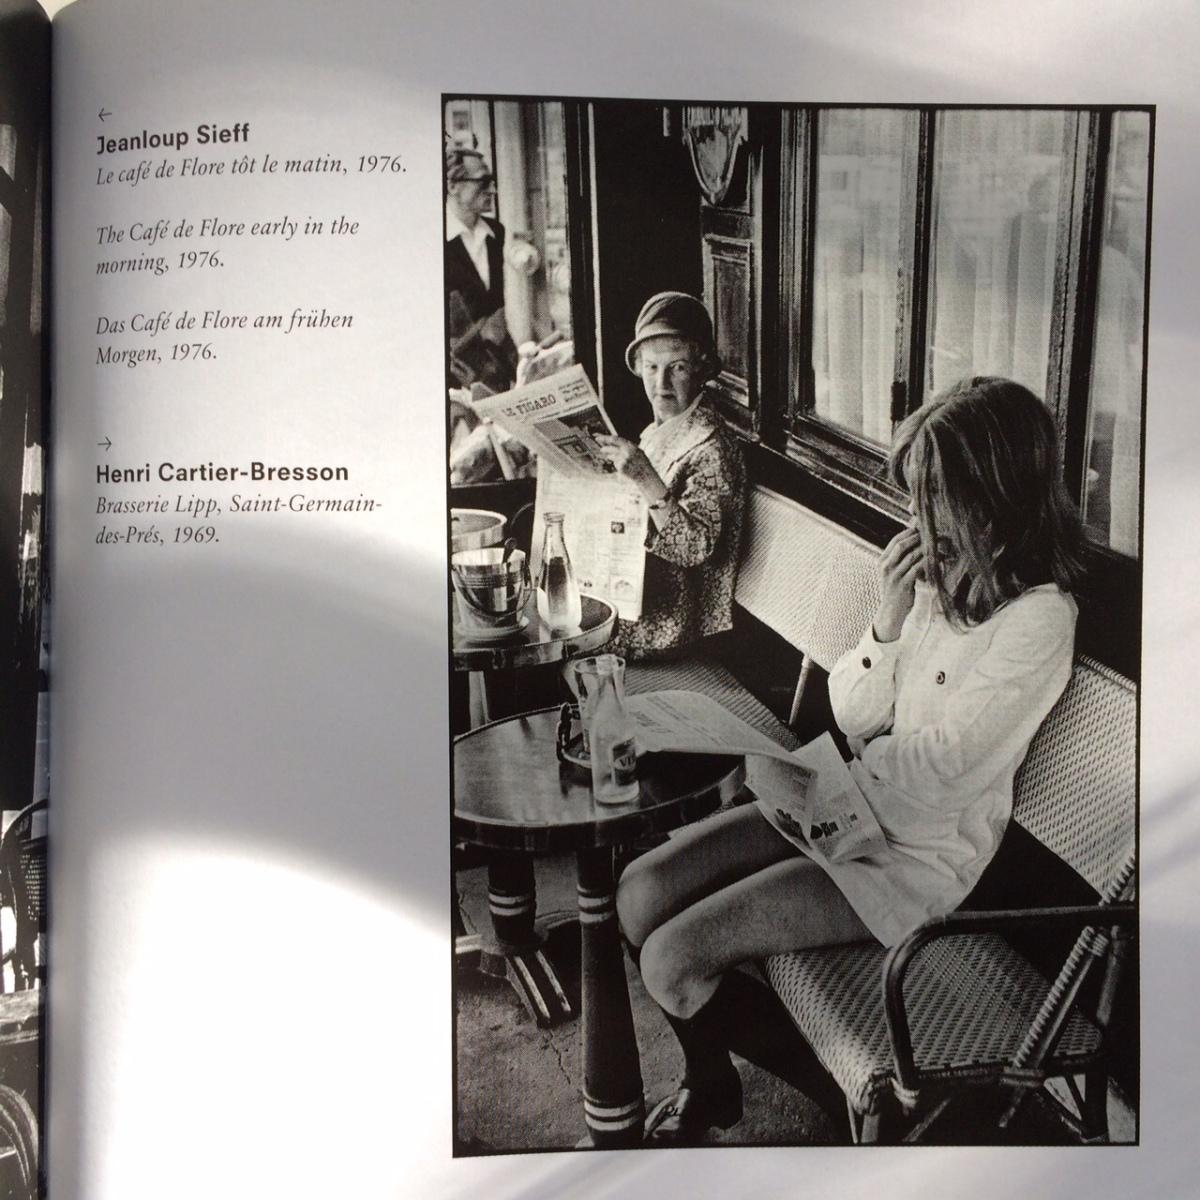 Brasserie Lipp, Saint-Germain-des-Pres, 1969 -Henri Cartier-Bresson